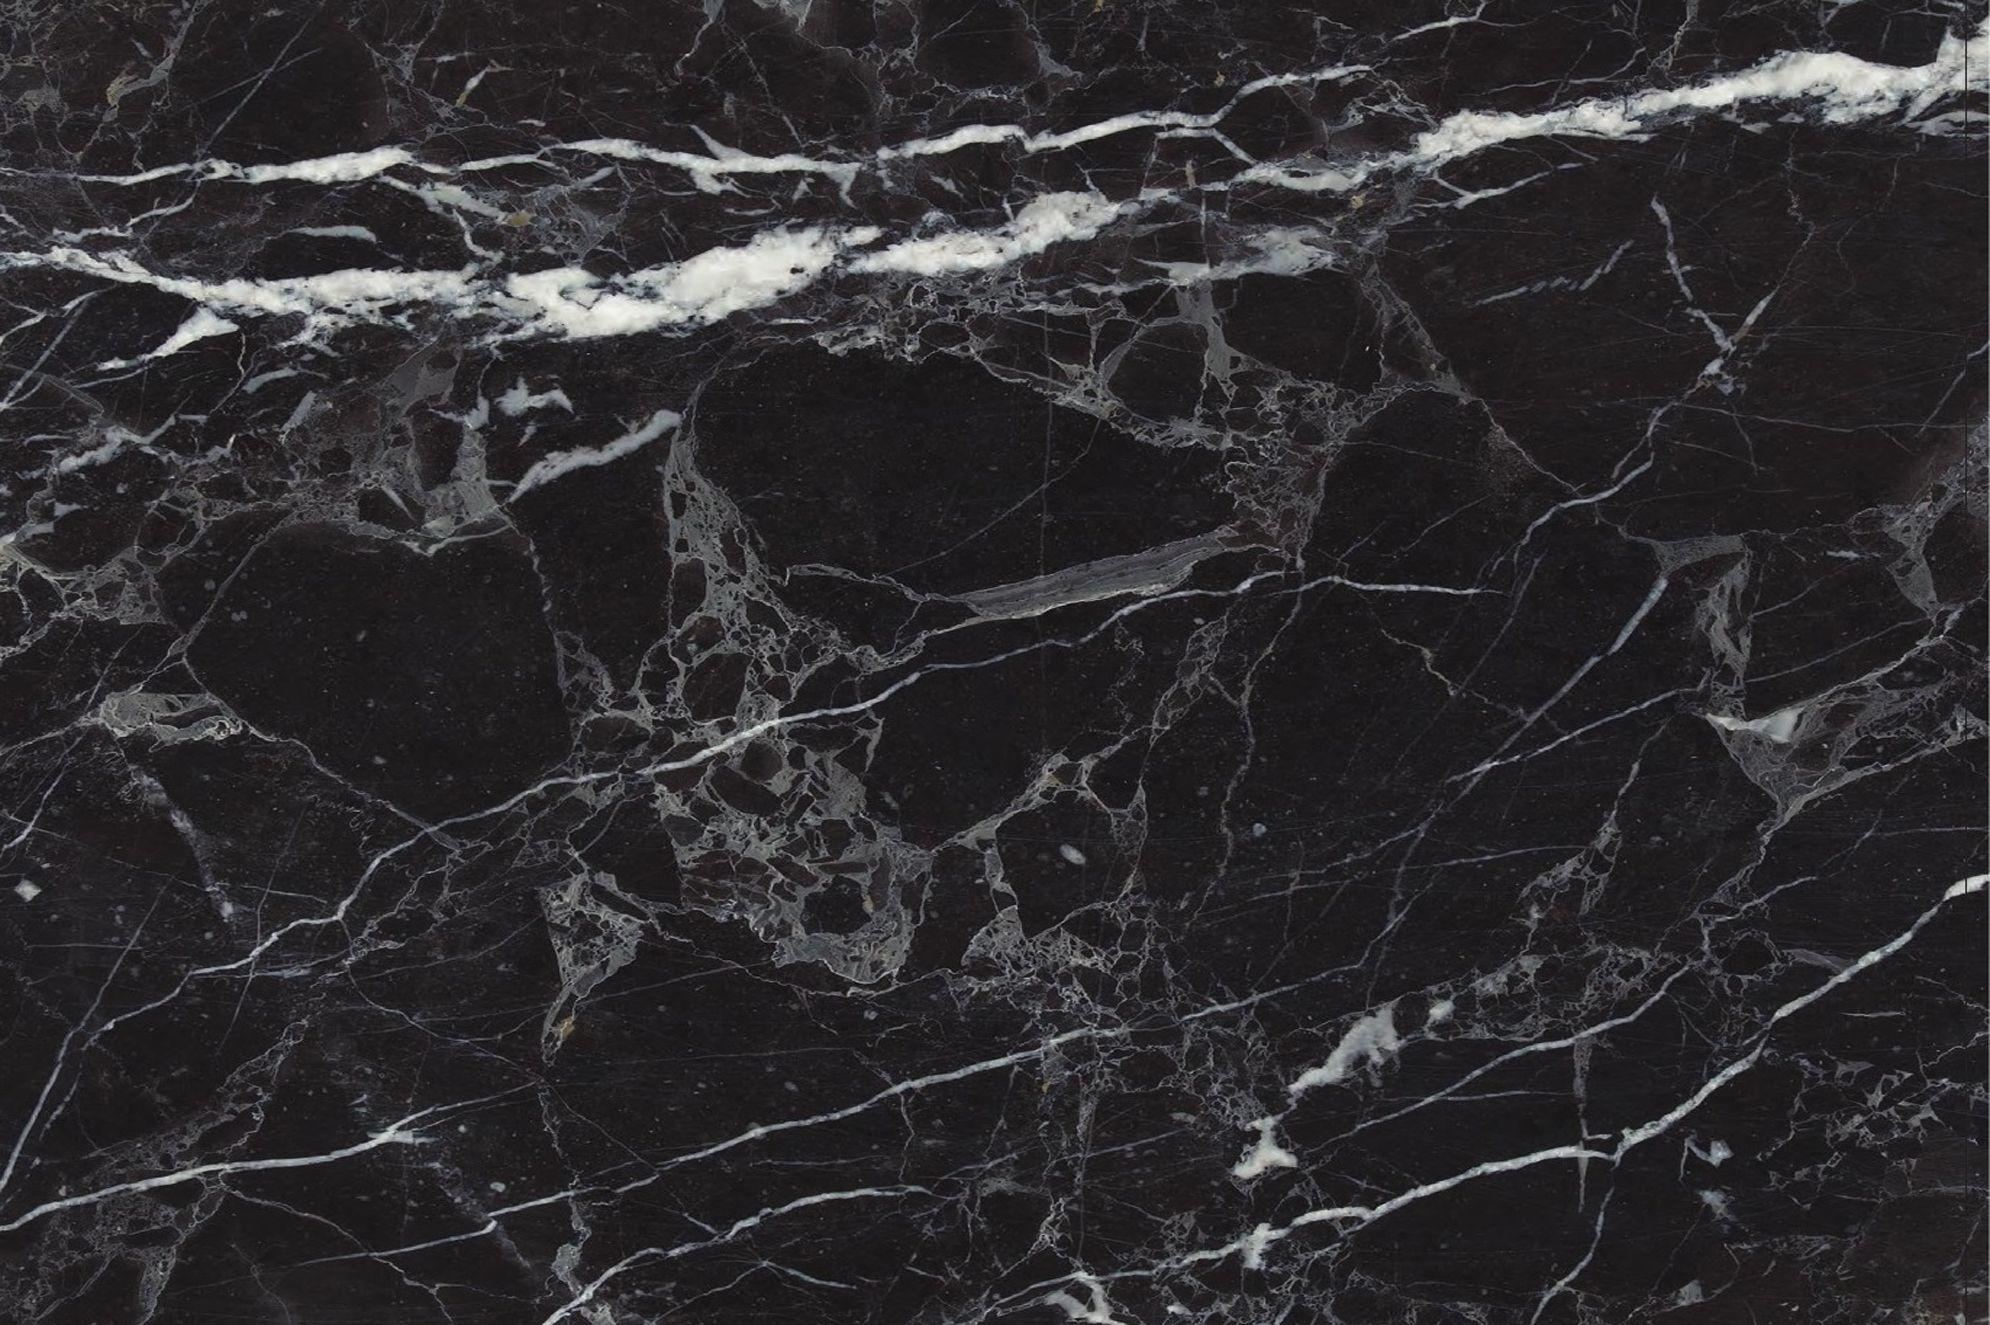 Black Marble Texture Design Ideas 610898 Decorating Ideas 1990x1325